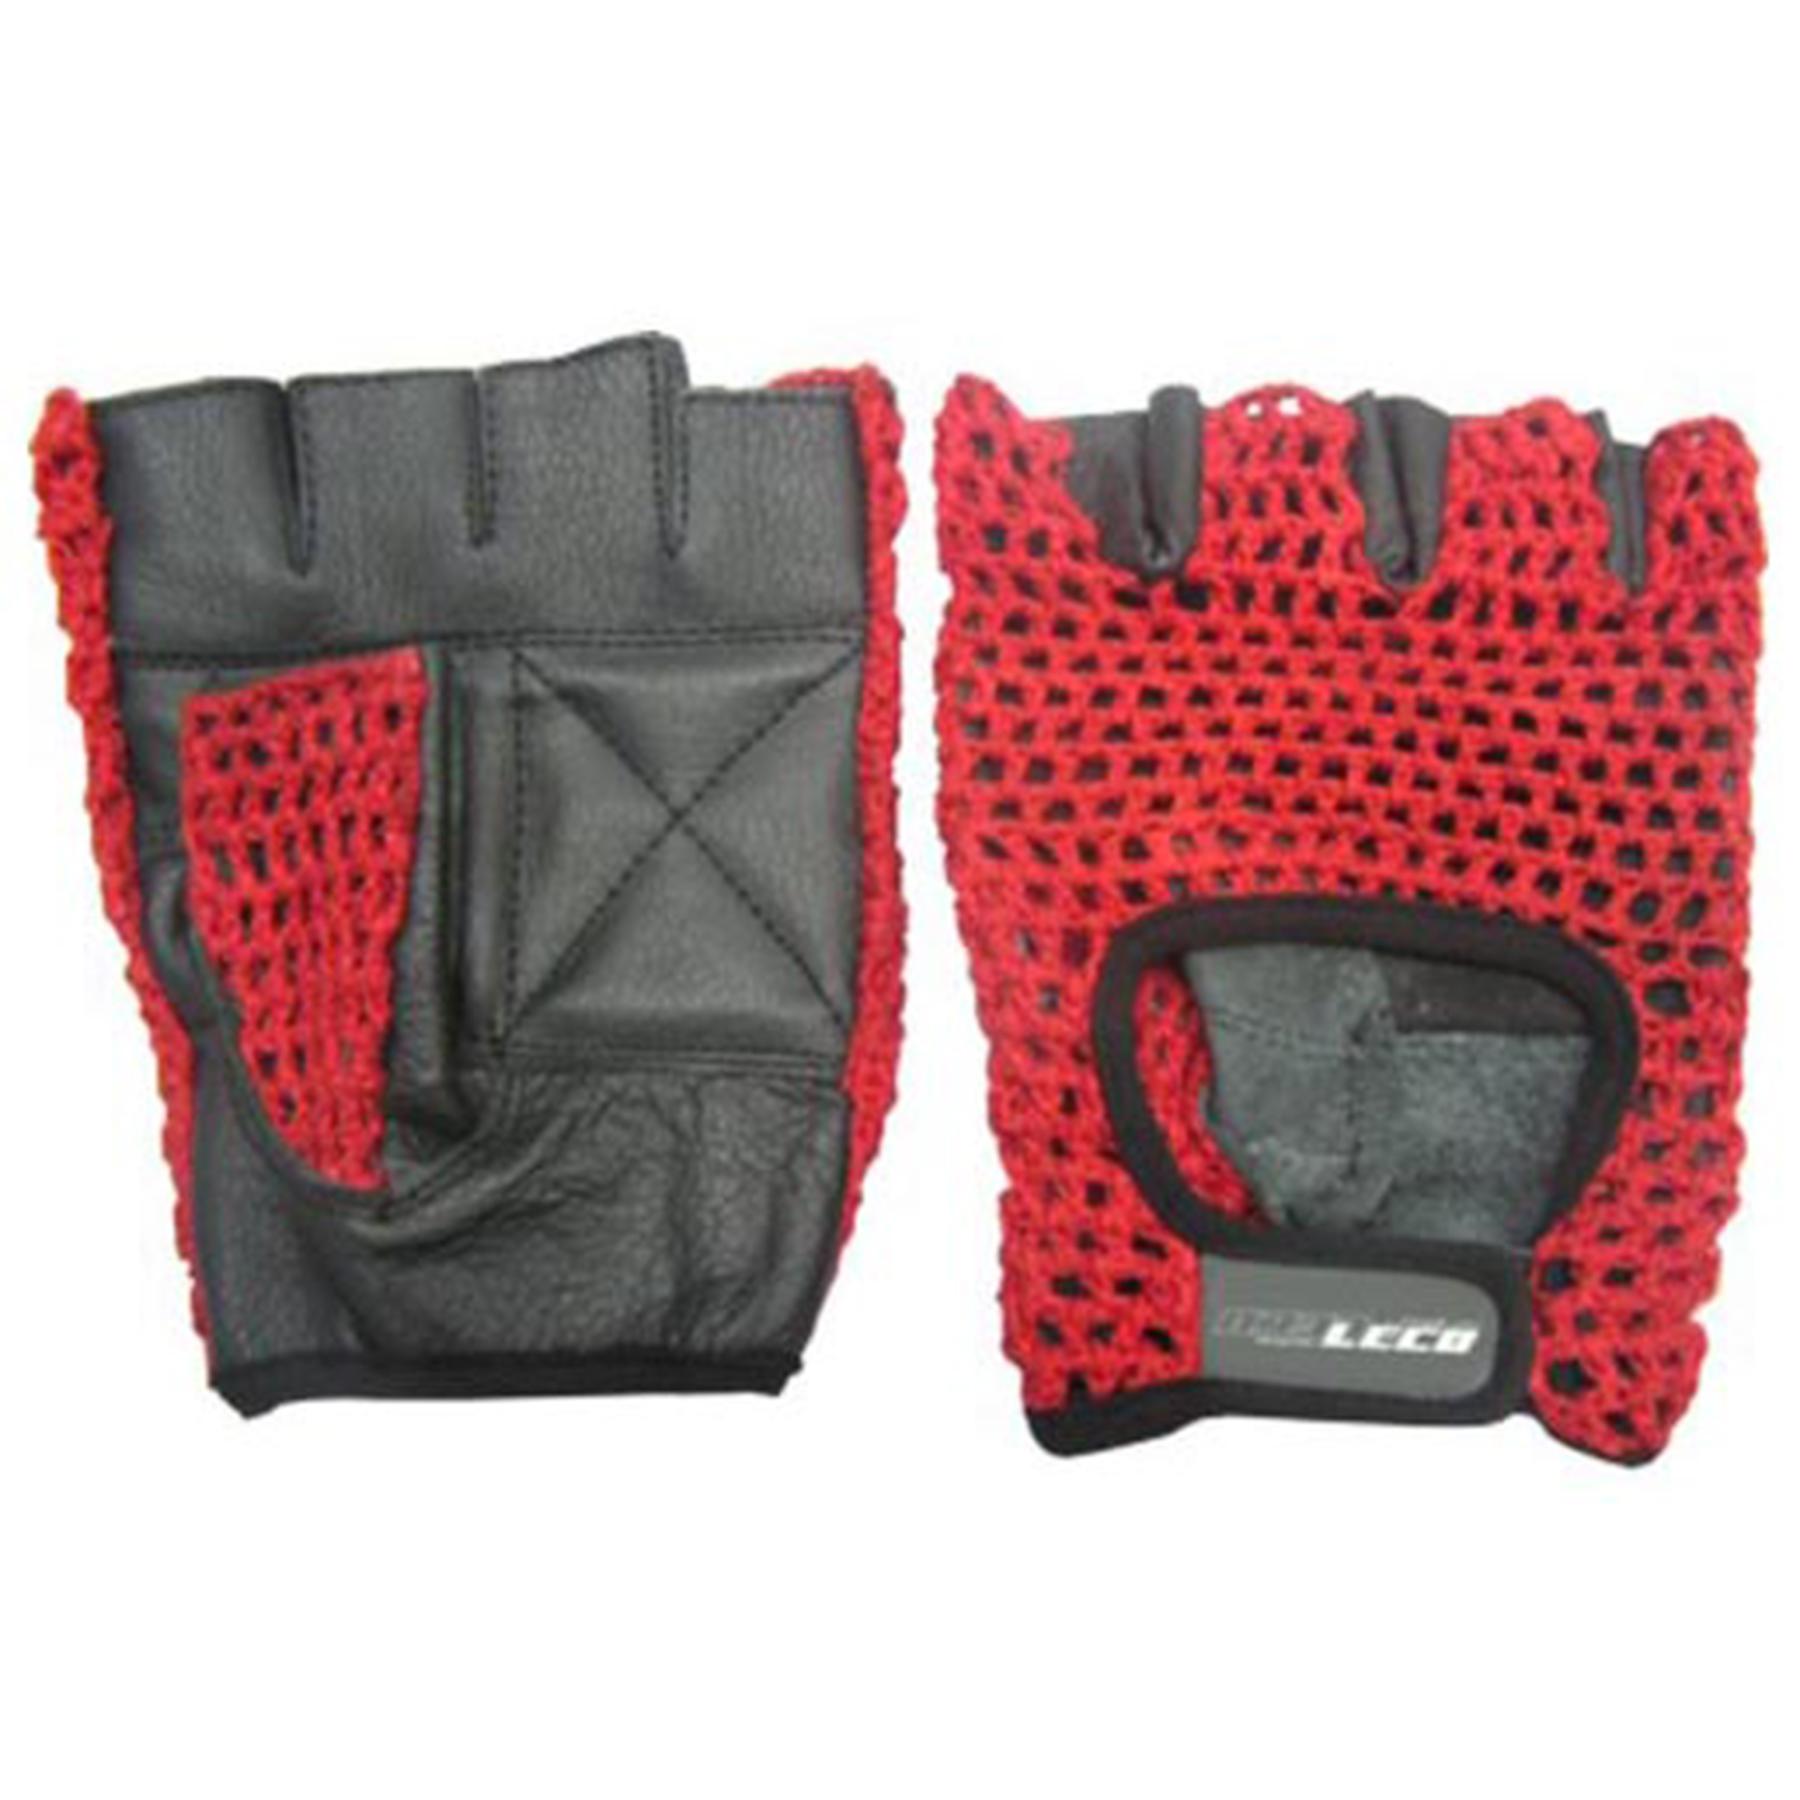 Перчатки для фитнеса ХОУМ кожа/сетка р. S (т11120-1)